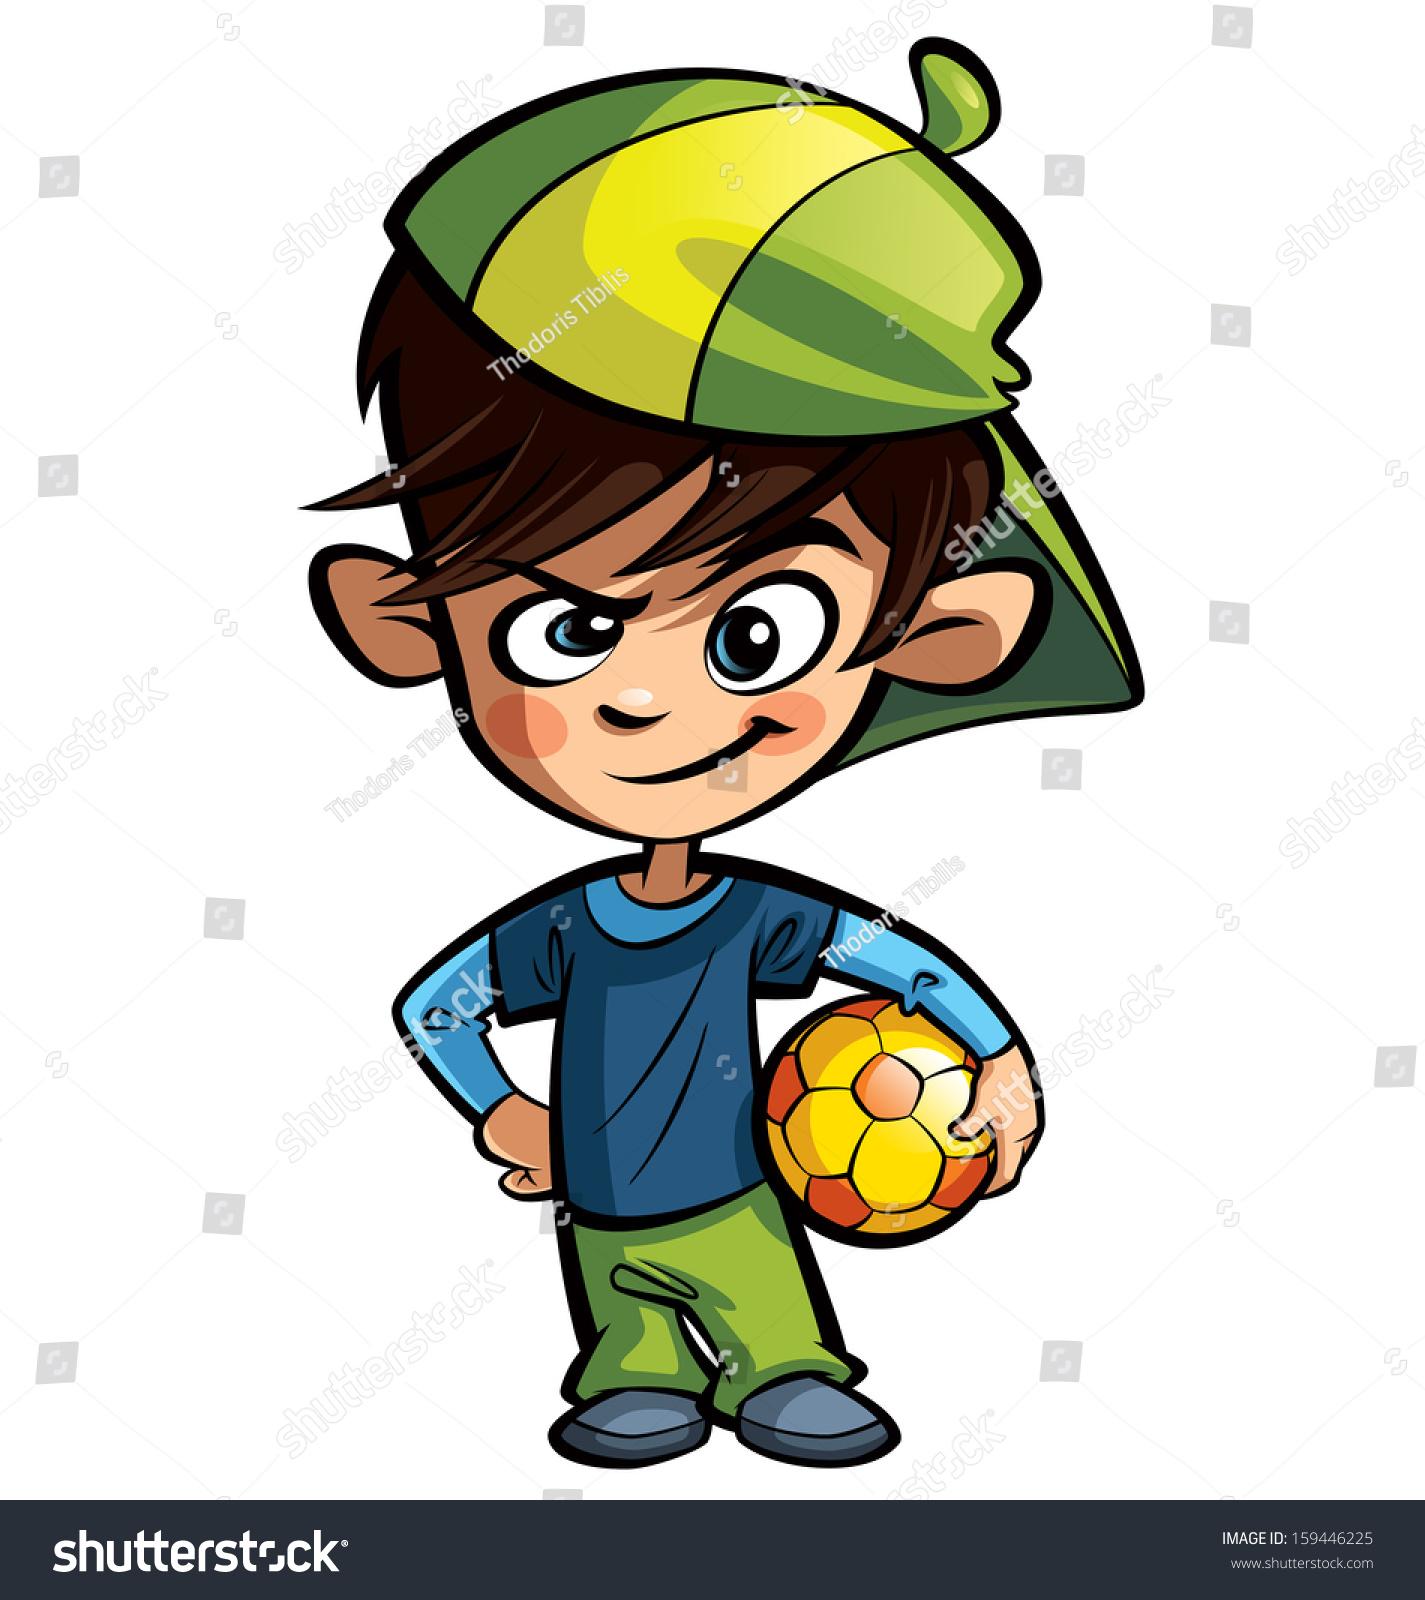 Cool Cartoon Boy Character Wearing Cap Stock Illustration